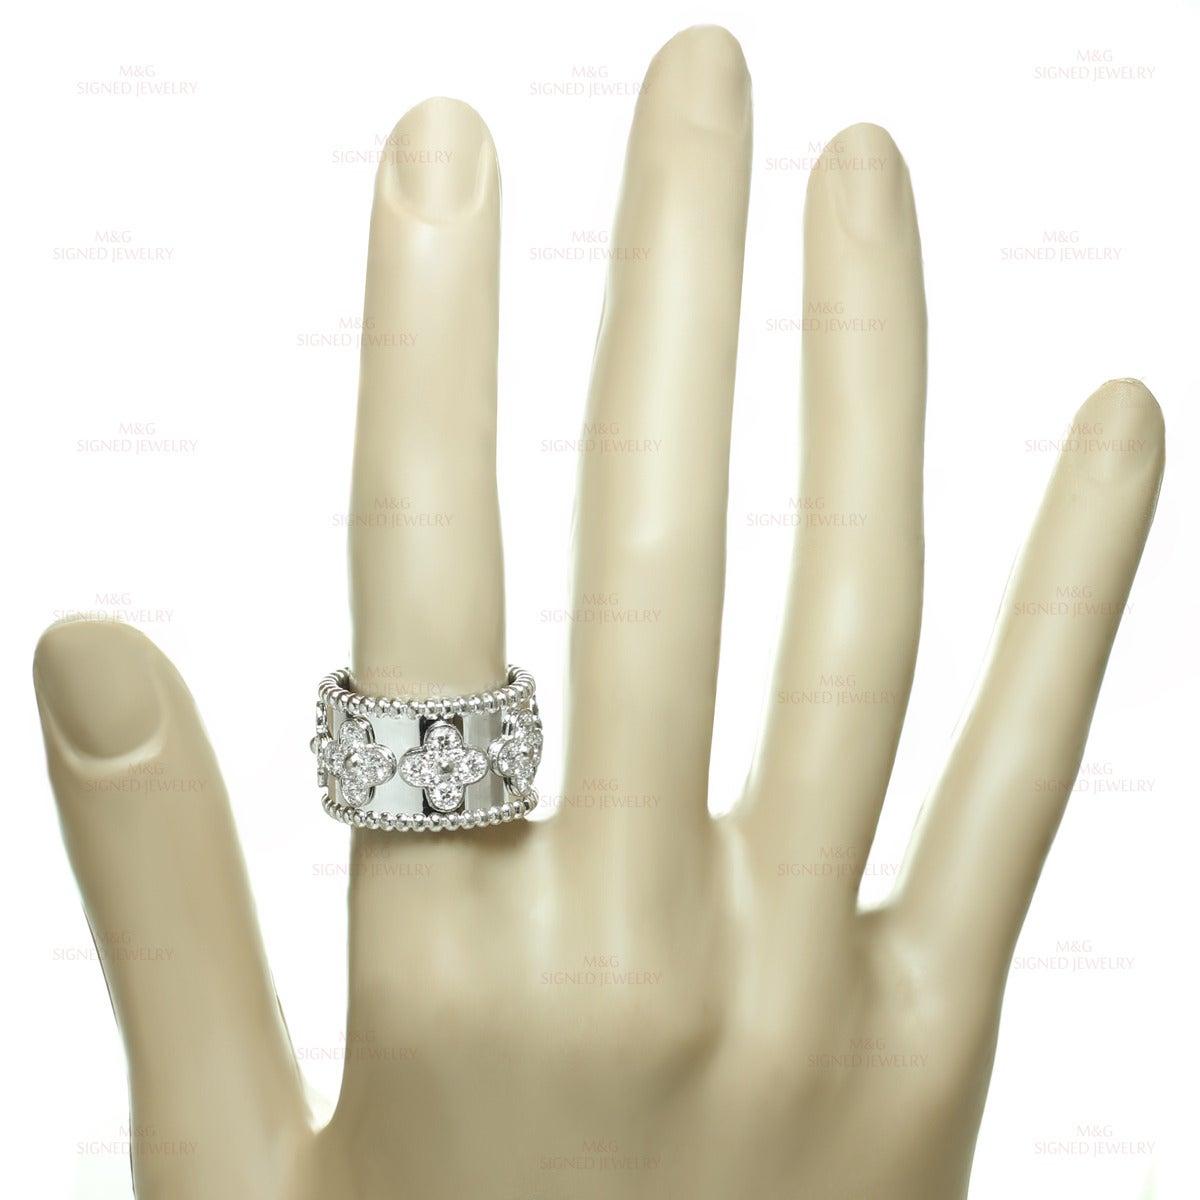 Van Cleef & Arpels Perlee Clover Diamond Gold Band Ring 3